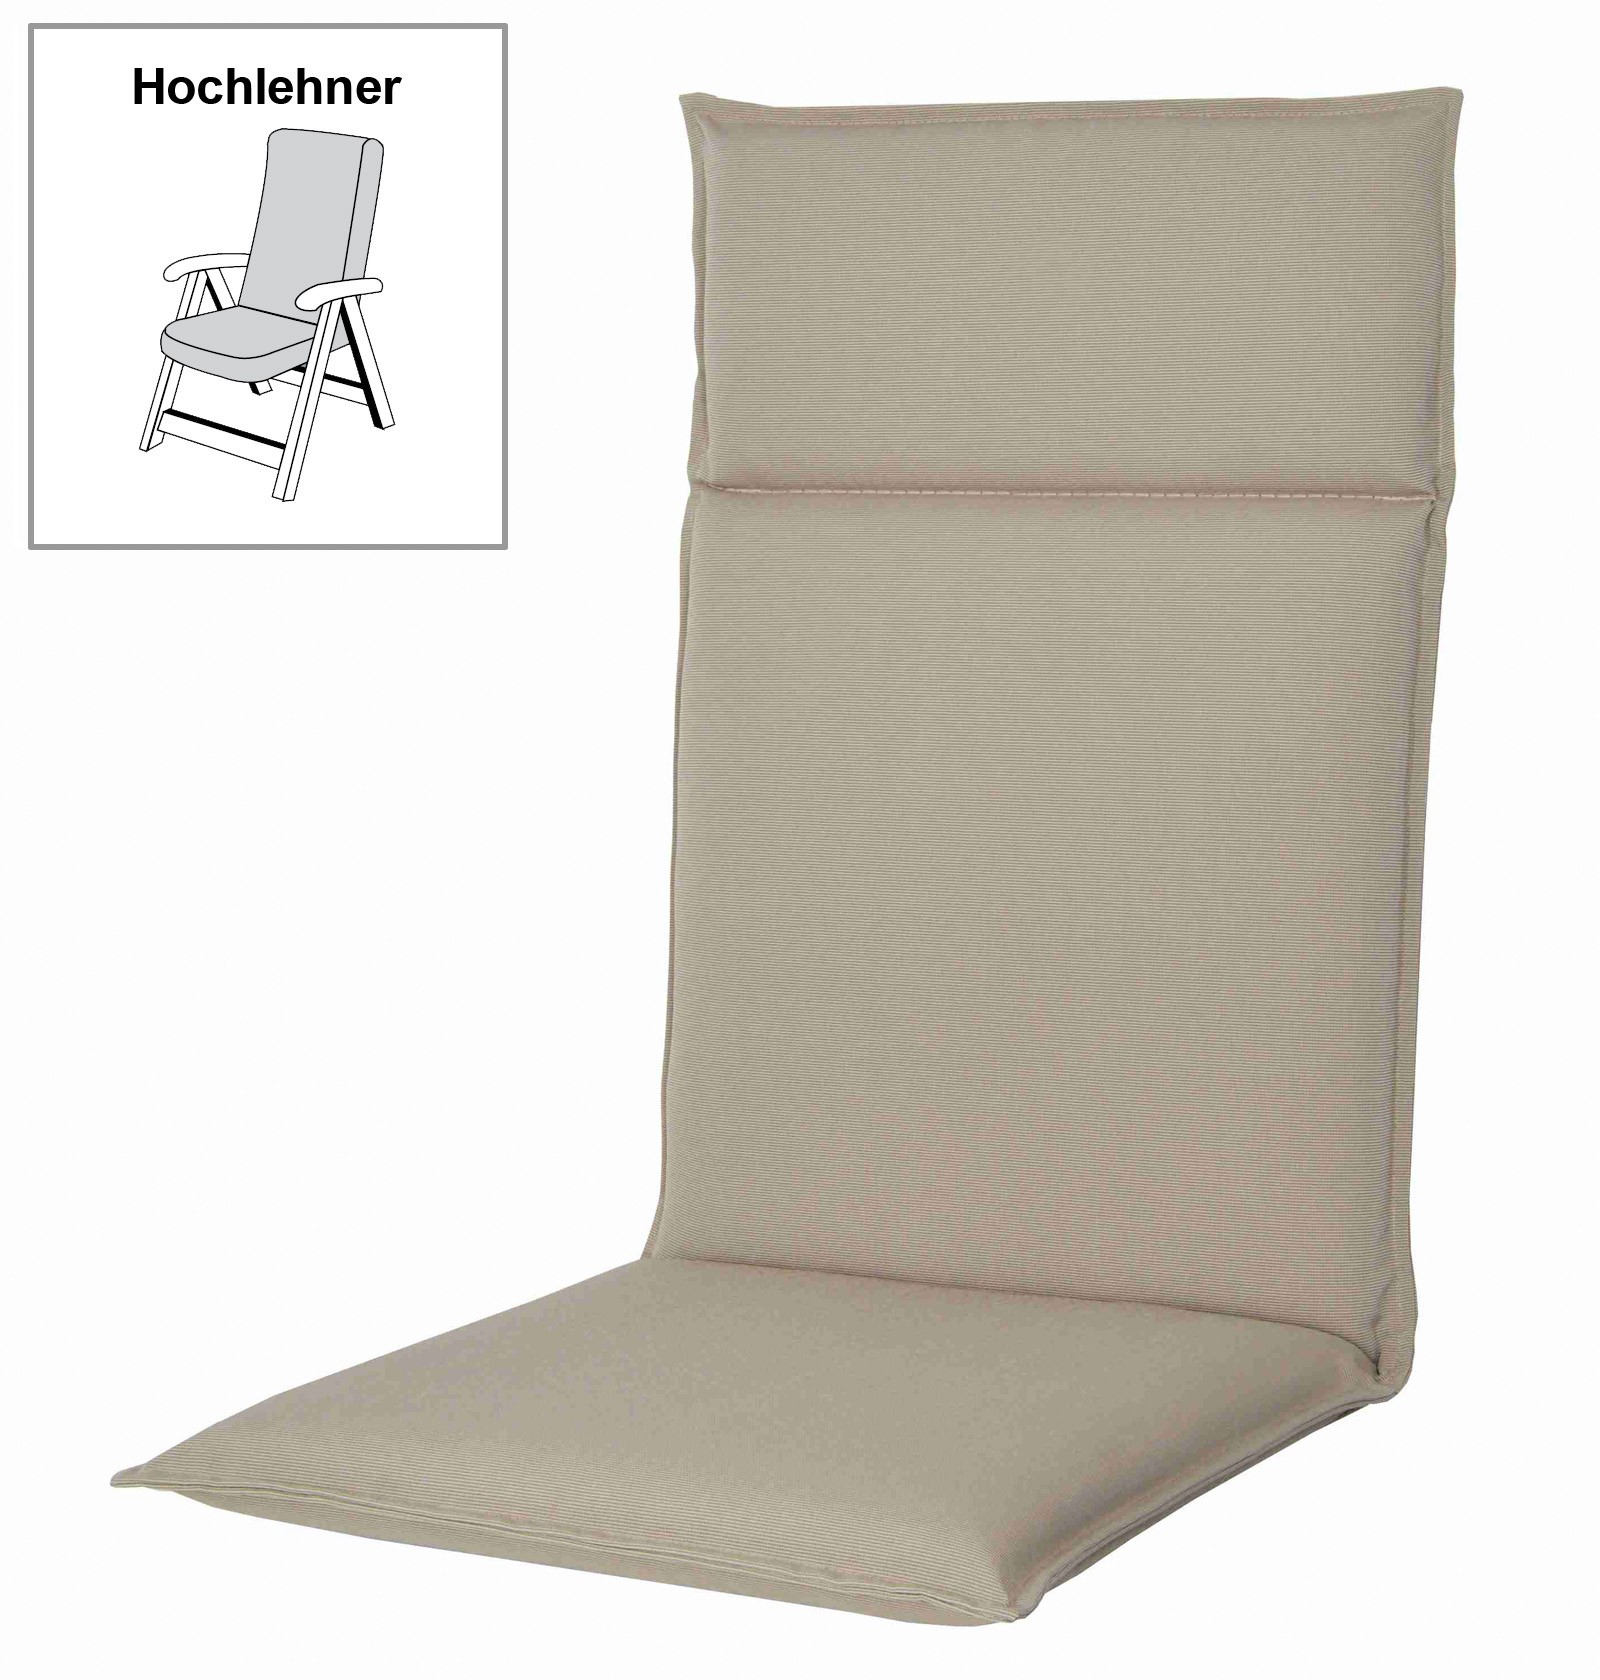 polster auflage f r gartenm bel gartensessel hl spirit d t847 bei. Black Bedroom Furniture Sets. Home Design Ideas